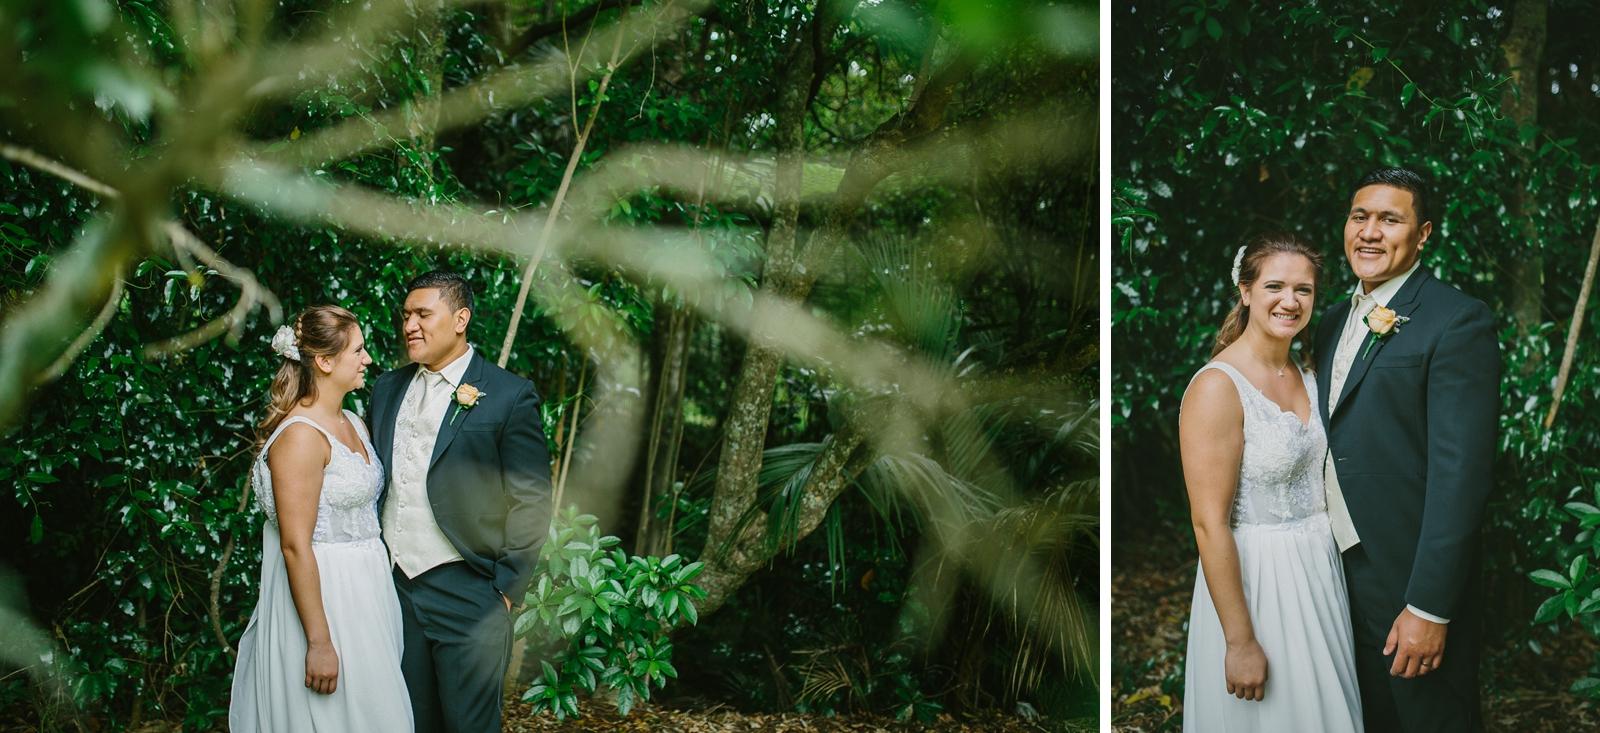 GabbyFiti_Auckland Wedding Photographer_Patty Lagera_0068.jpg